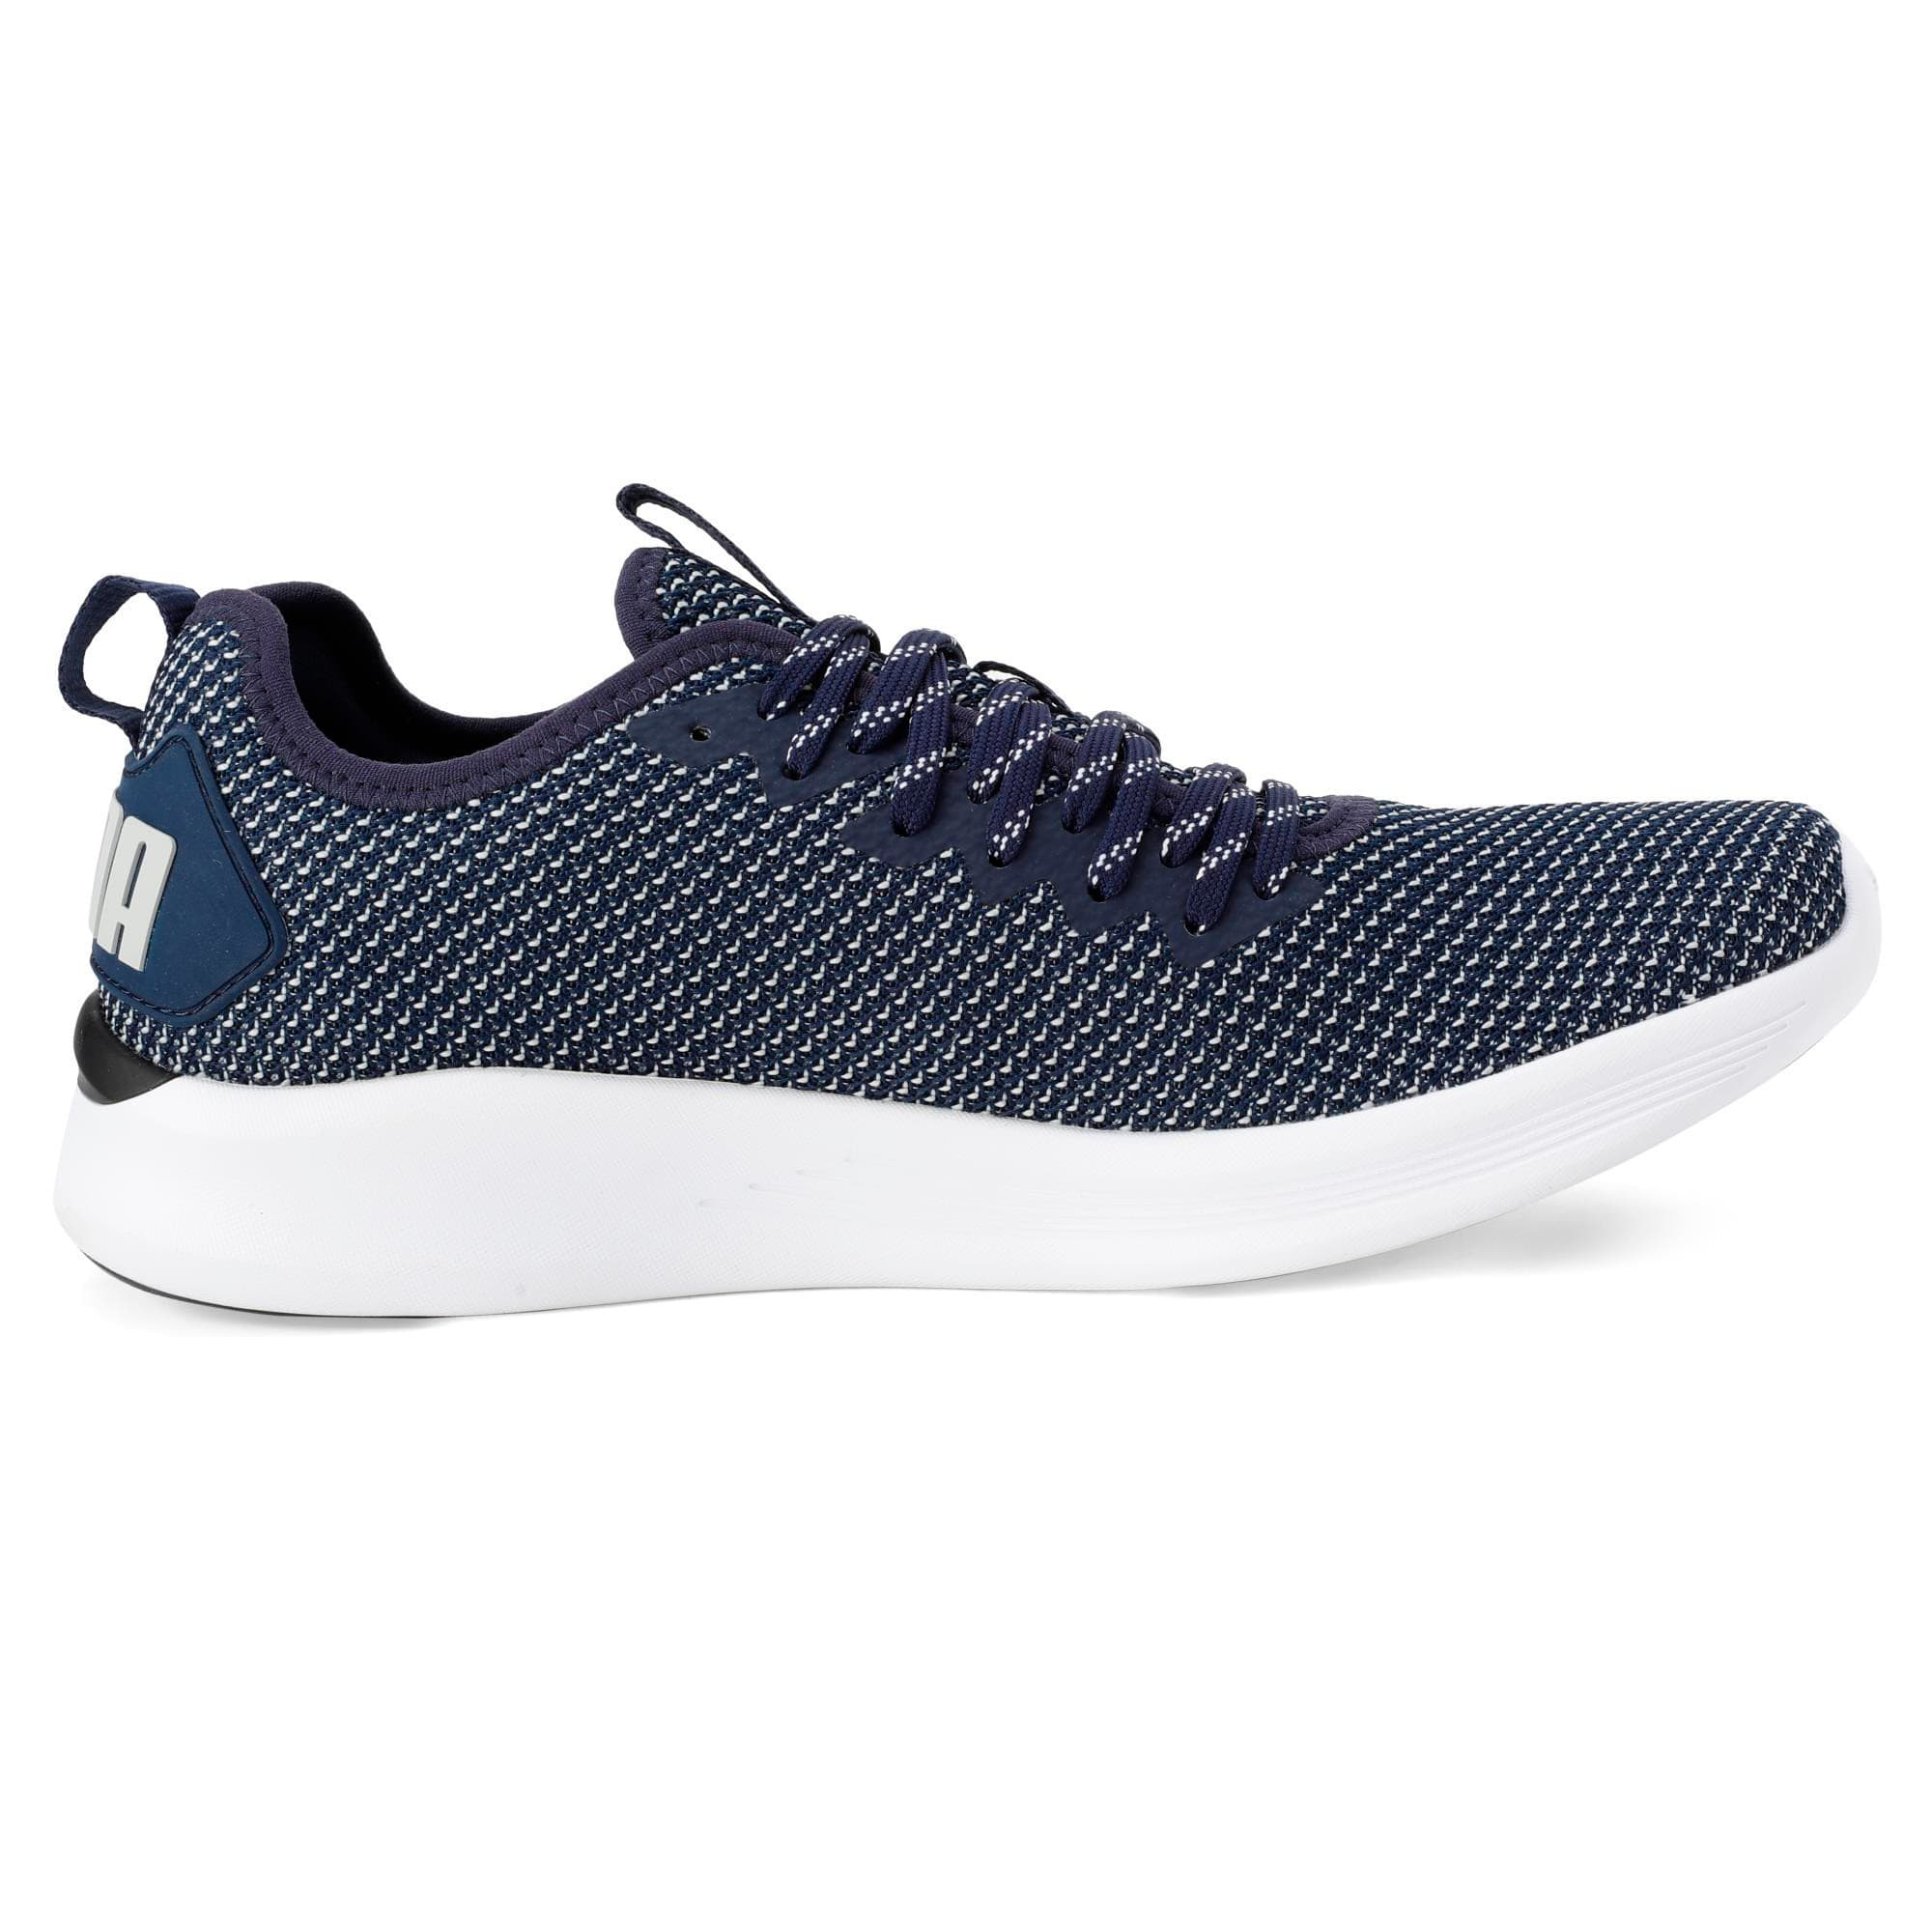 Thumbnail 7 of IGNITE Flash FS Men's Running Shoes, Peacoat-Glacier Gray-White, medium-IND